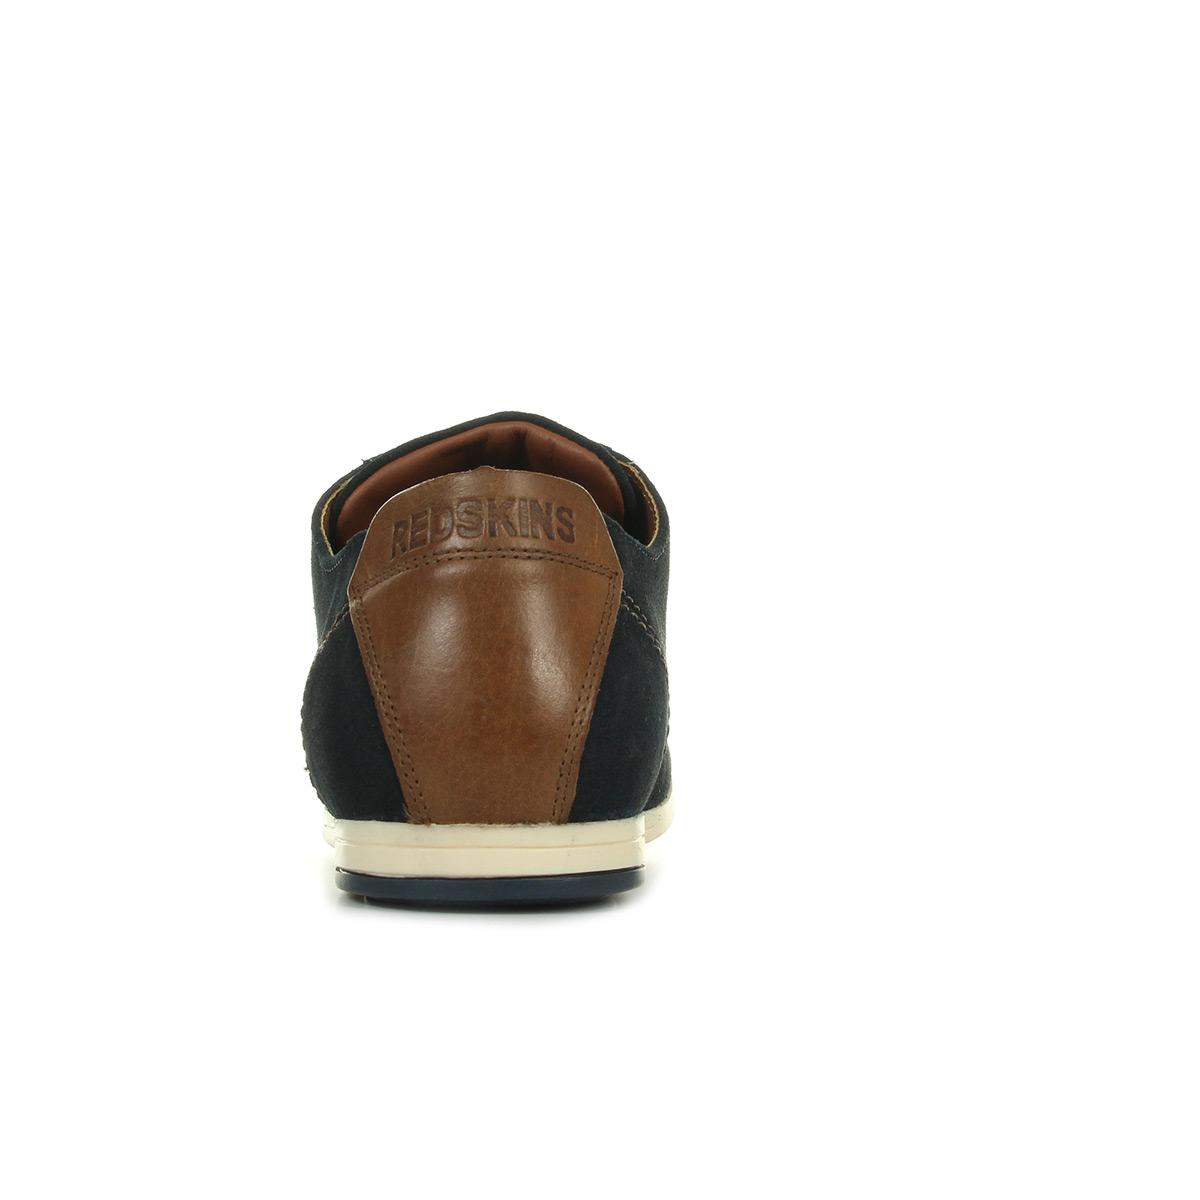 Chaussures Redskins Nail Marine 8GIBO97C